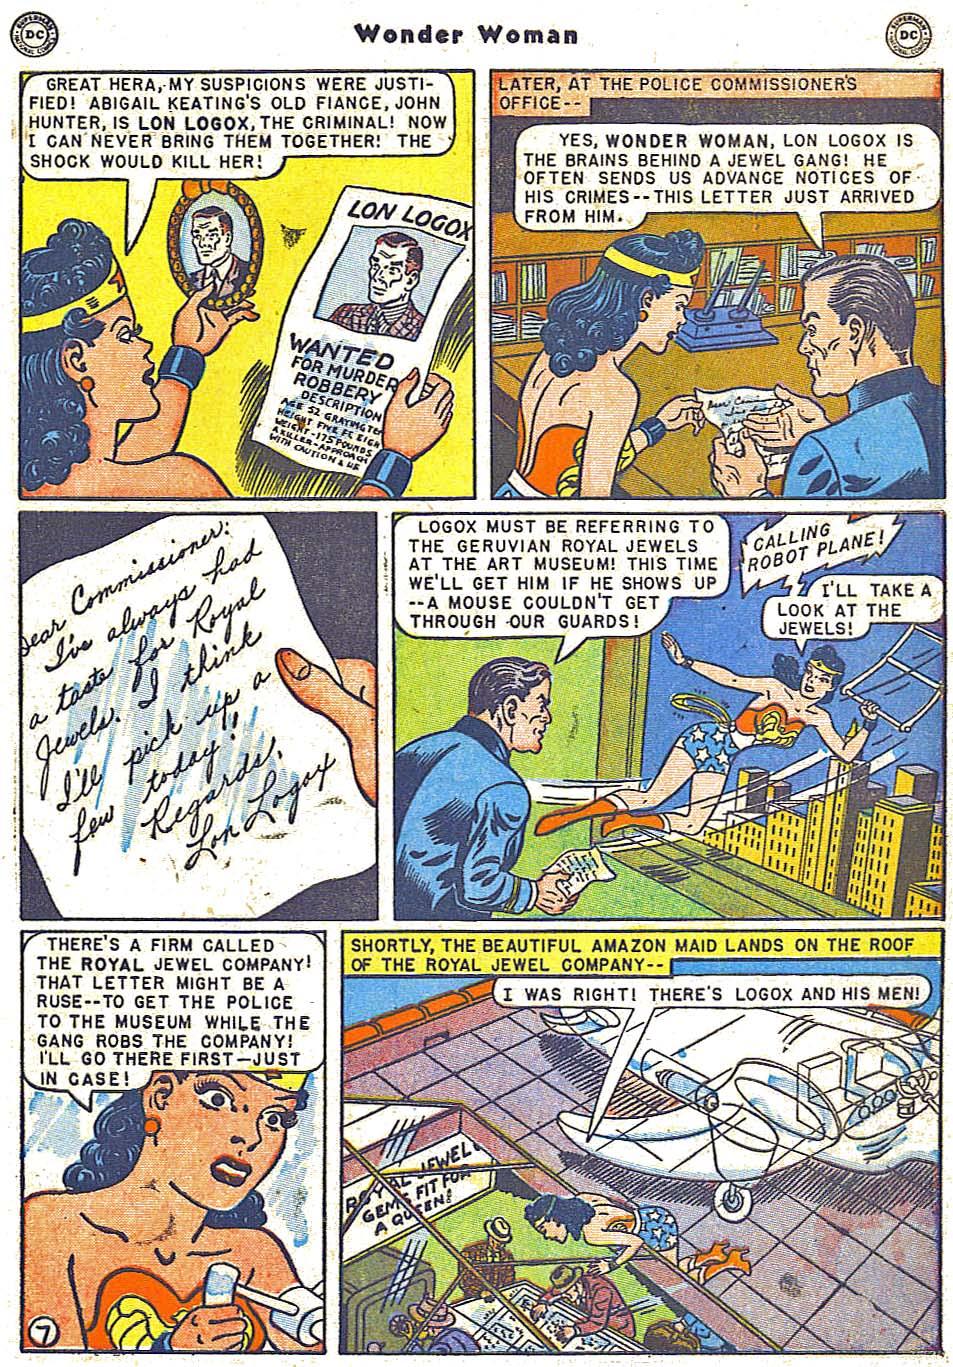 Read online Wonder Woman (1942) comic -  Issue #38 - 9